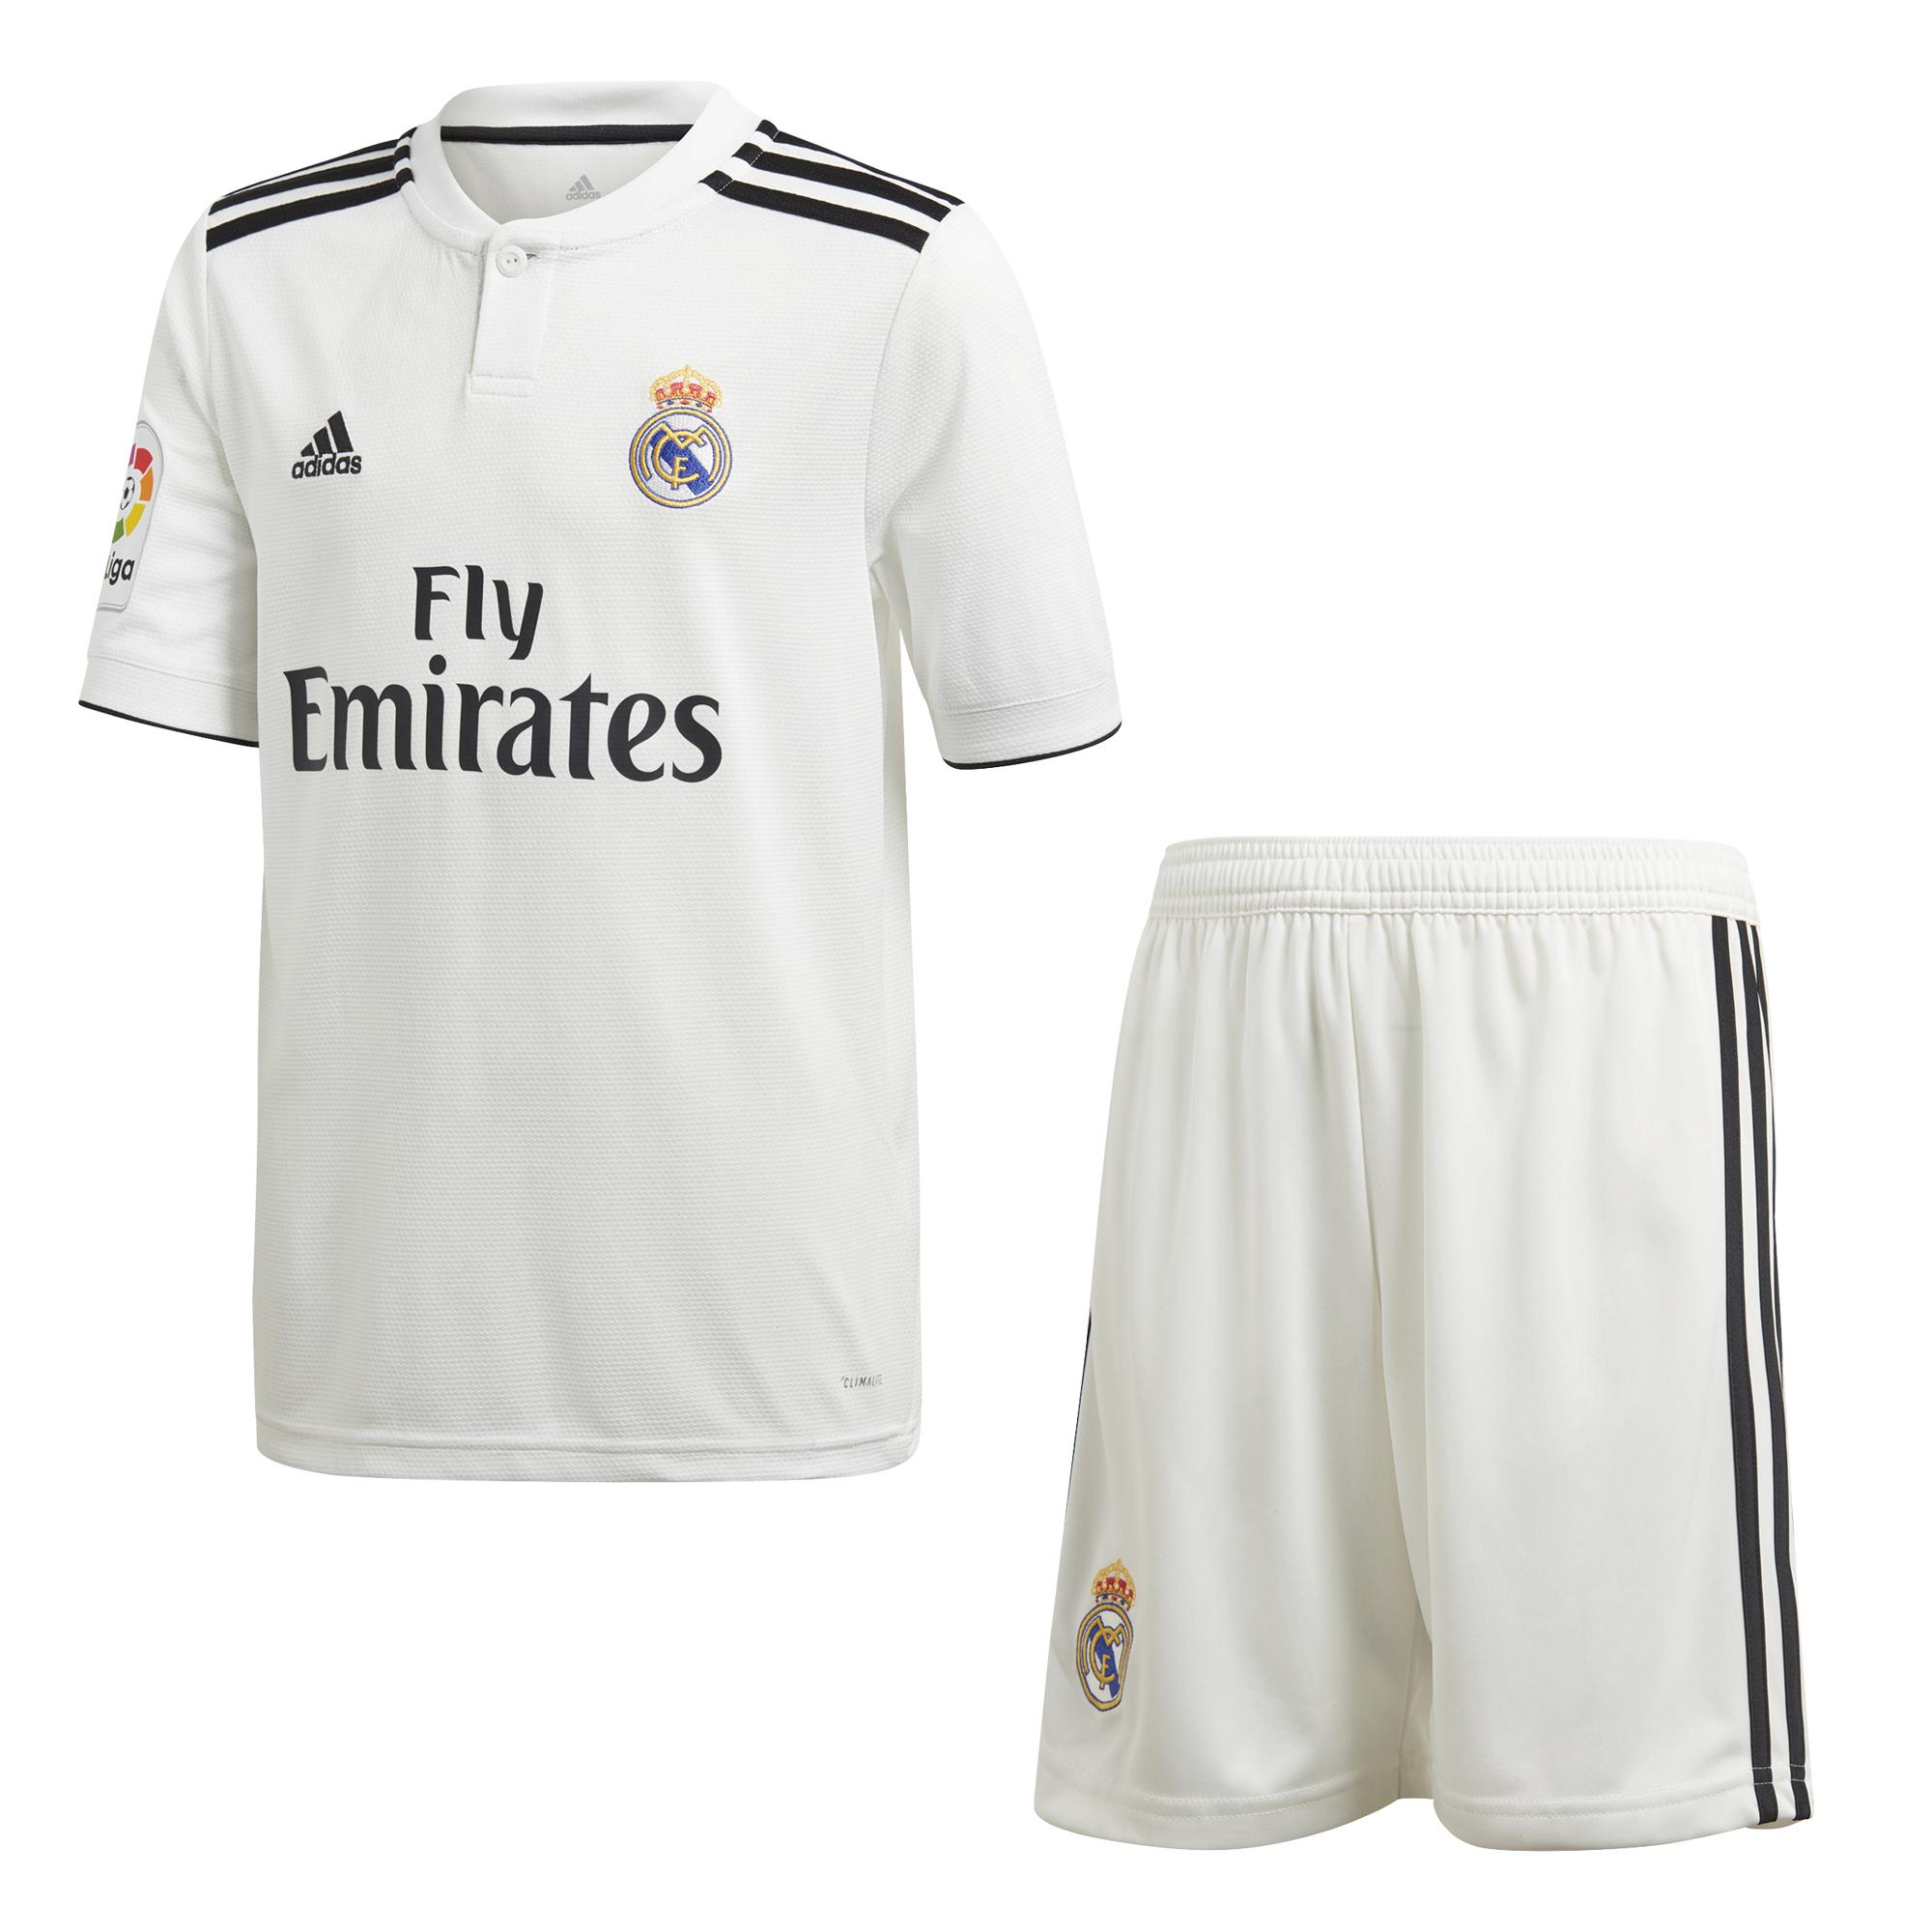 Real 2018 Hose Kinder C3lsr5j4aq Kit 2019 Trikot Madrid Adidas Home 34R5ALqj